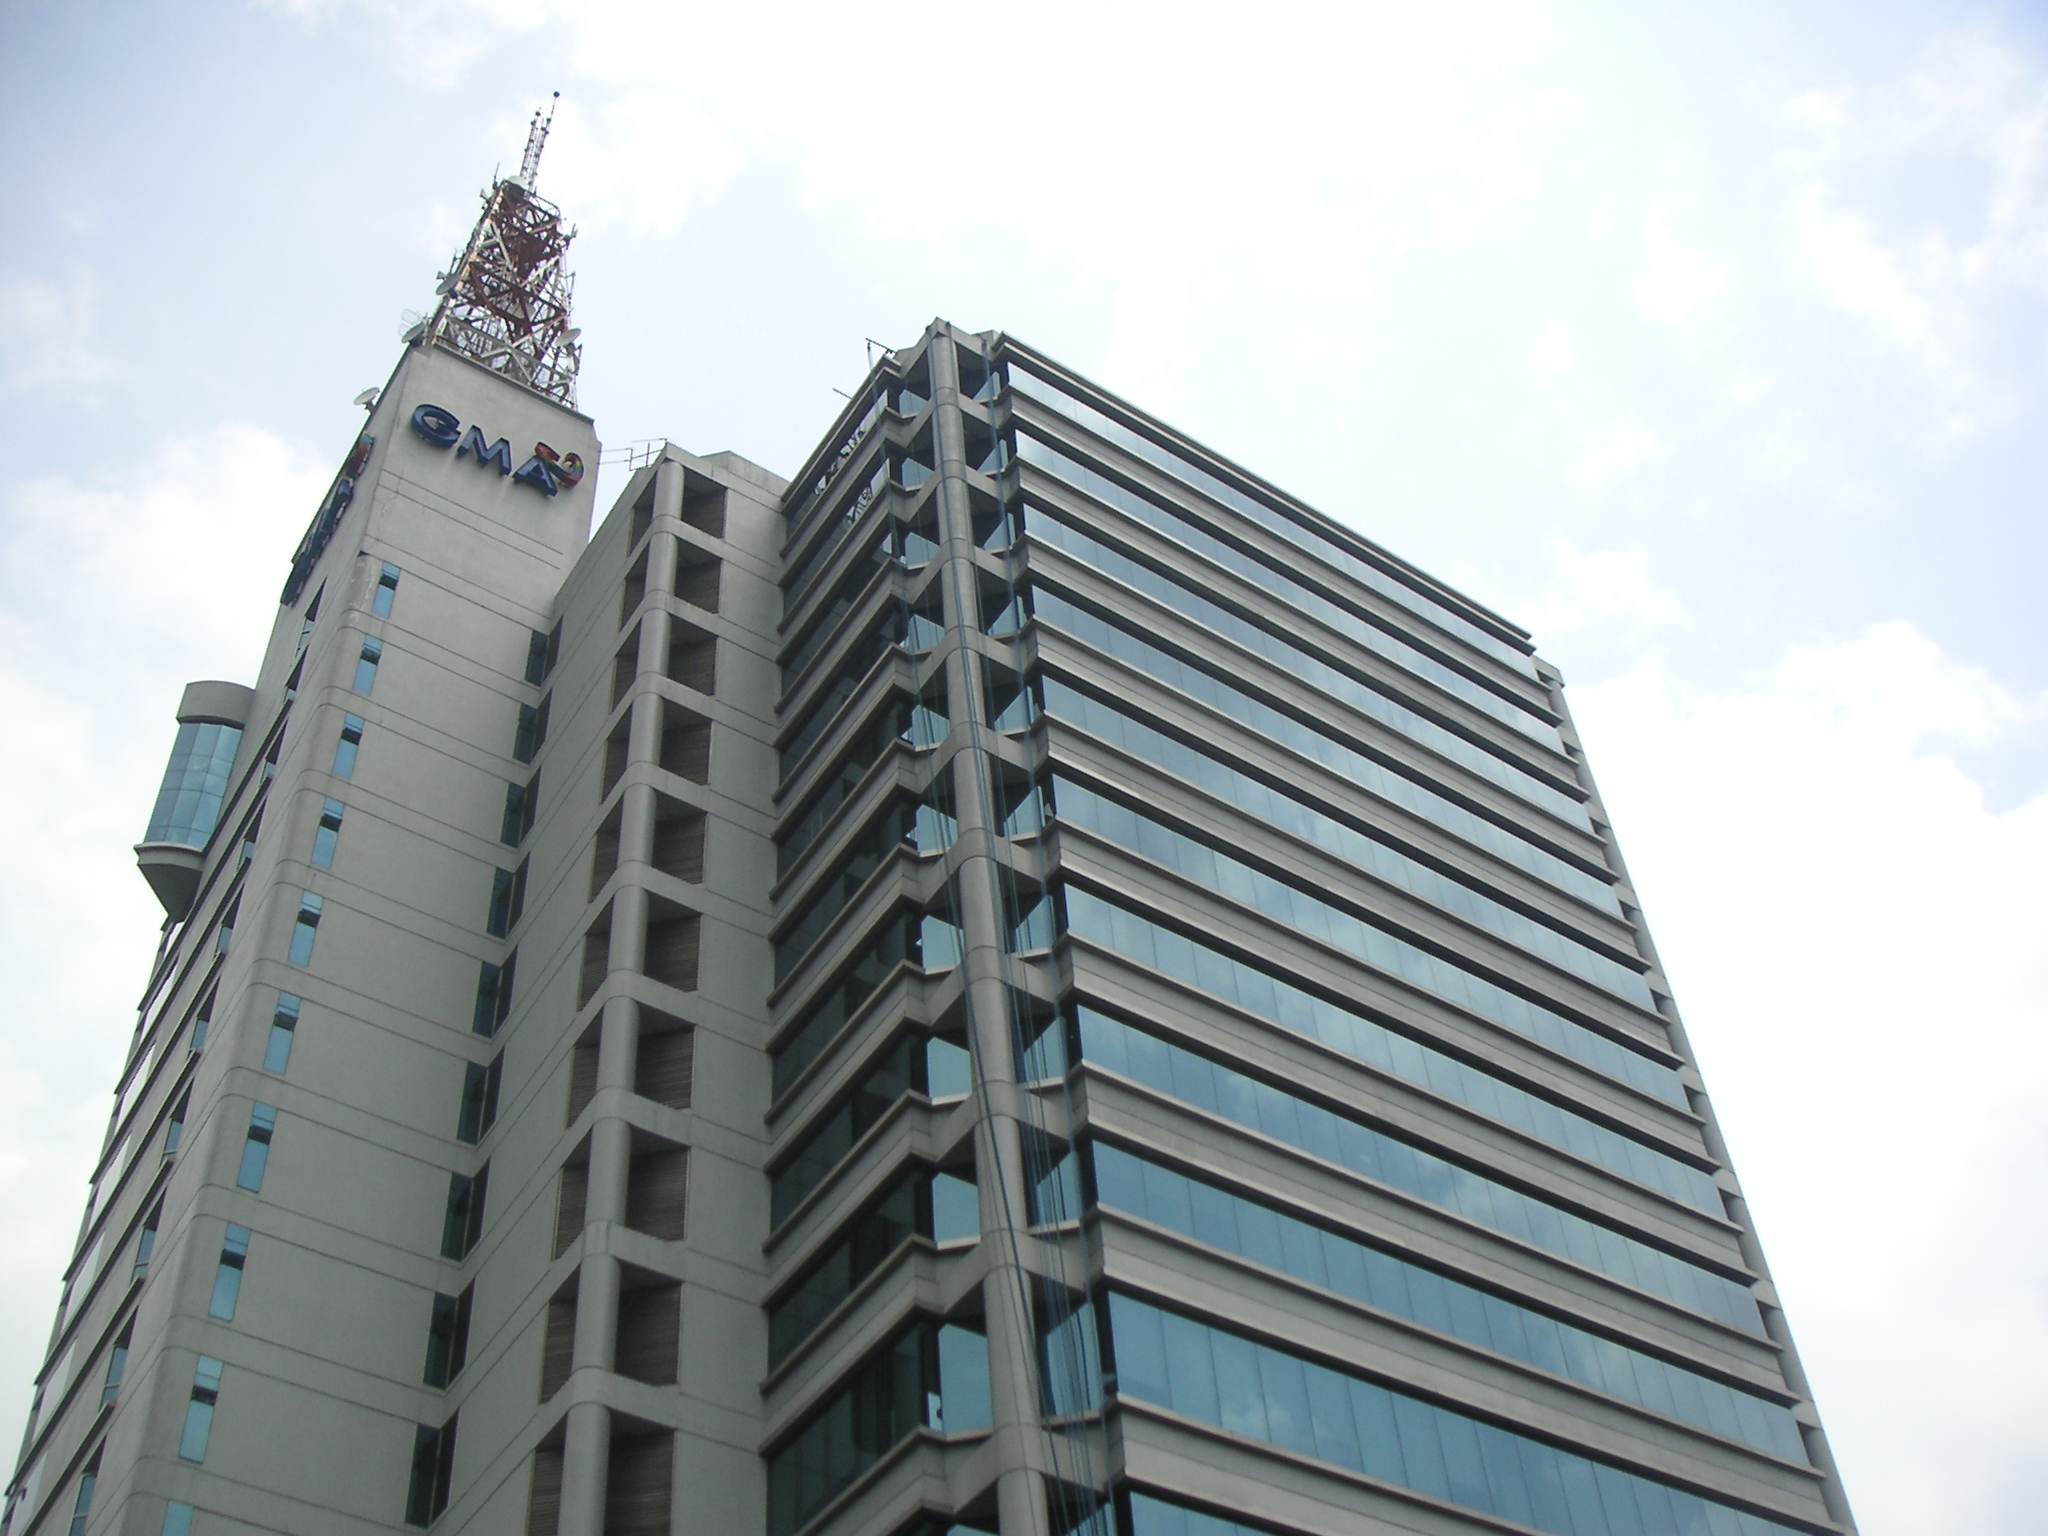 GMA Network Center